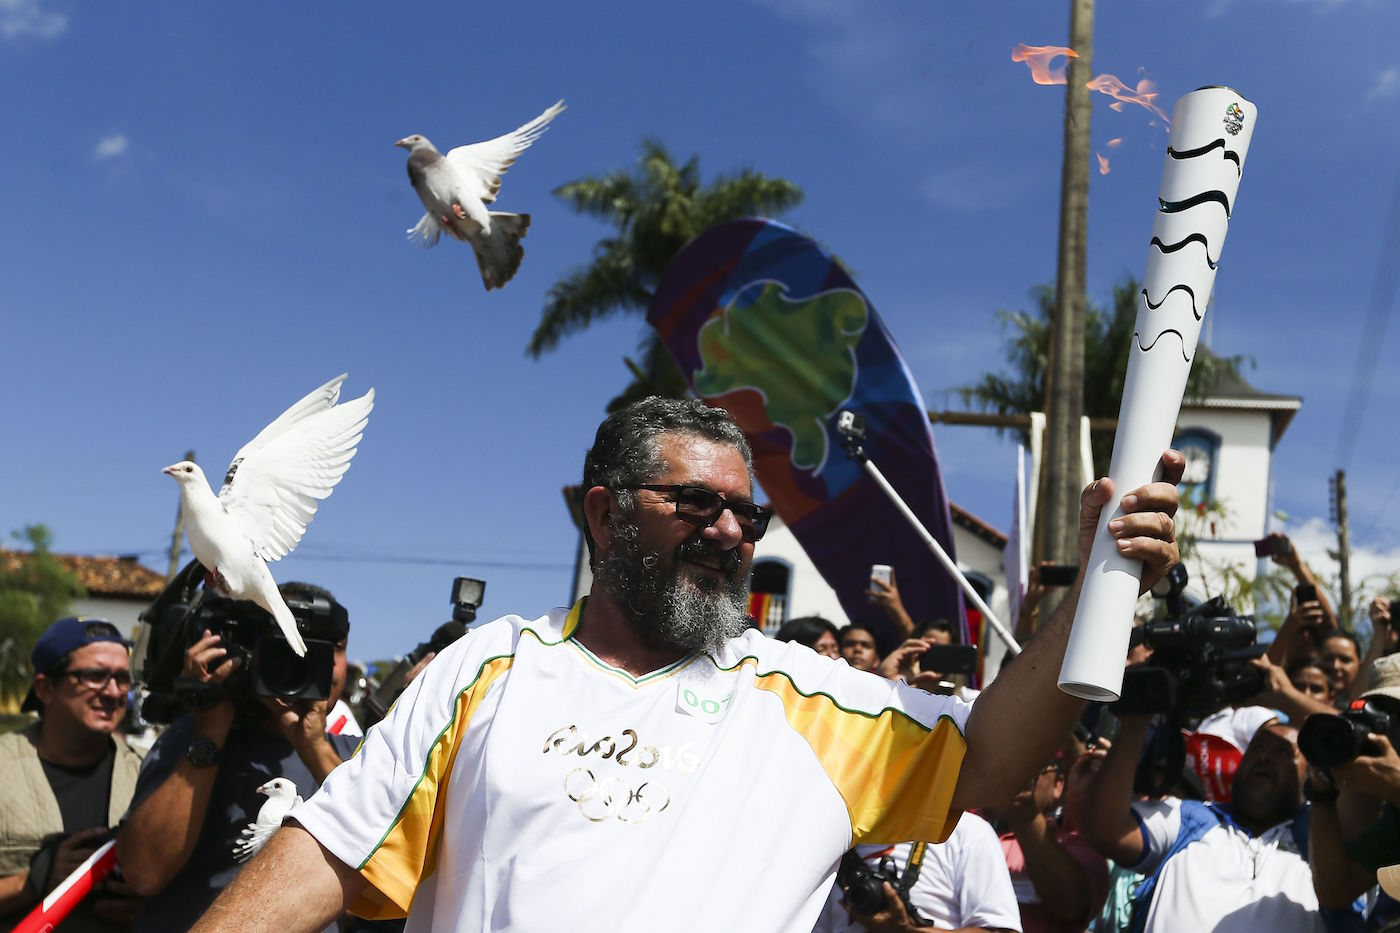 The Olympic torch relay for Rio 2016 in Corumbá de Goiás (photo by Marcelo Camargo/Agência Brasil, via Wikimedia)